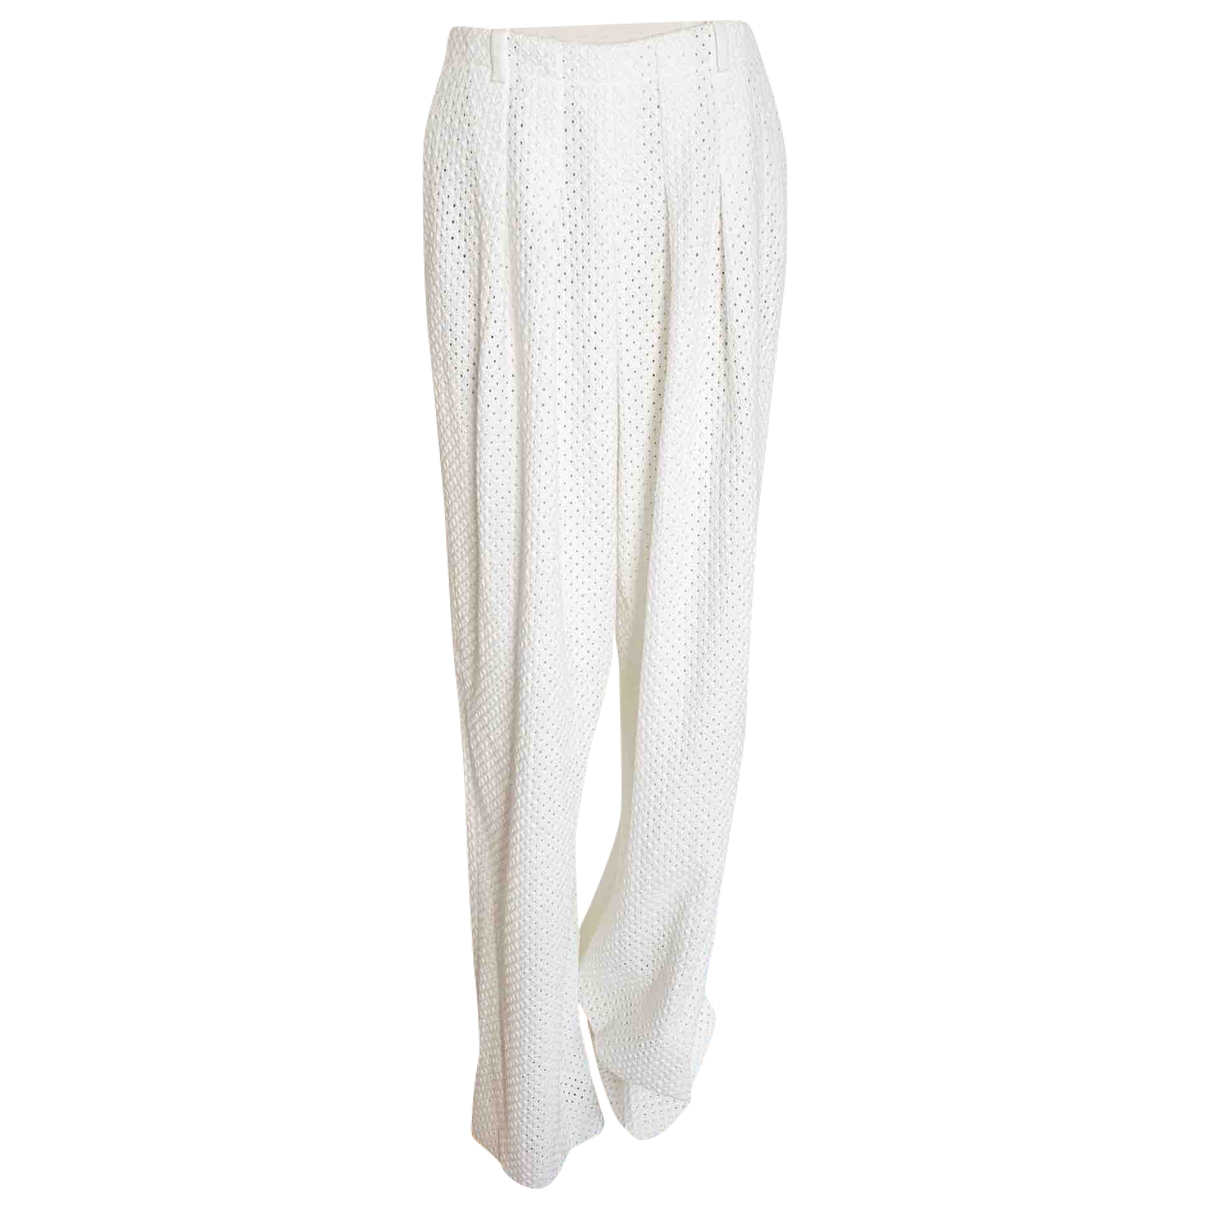 Chloé \N Cotton Trousers for Women 36 FR